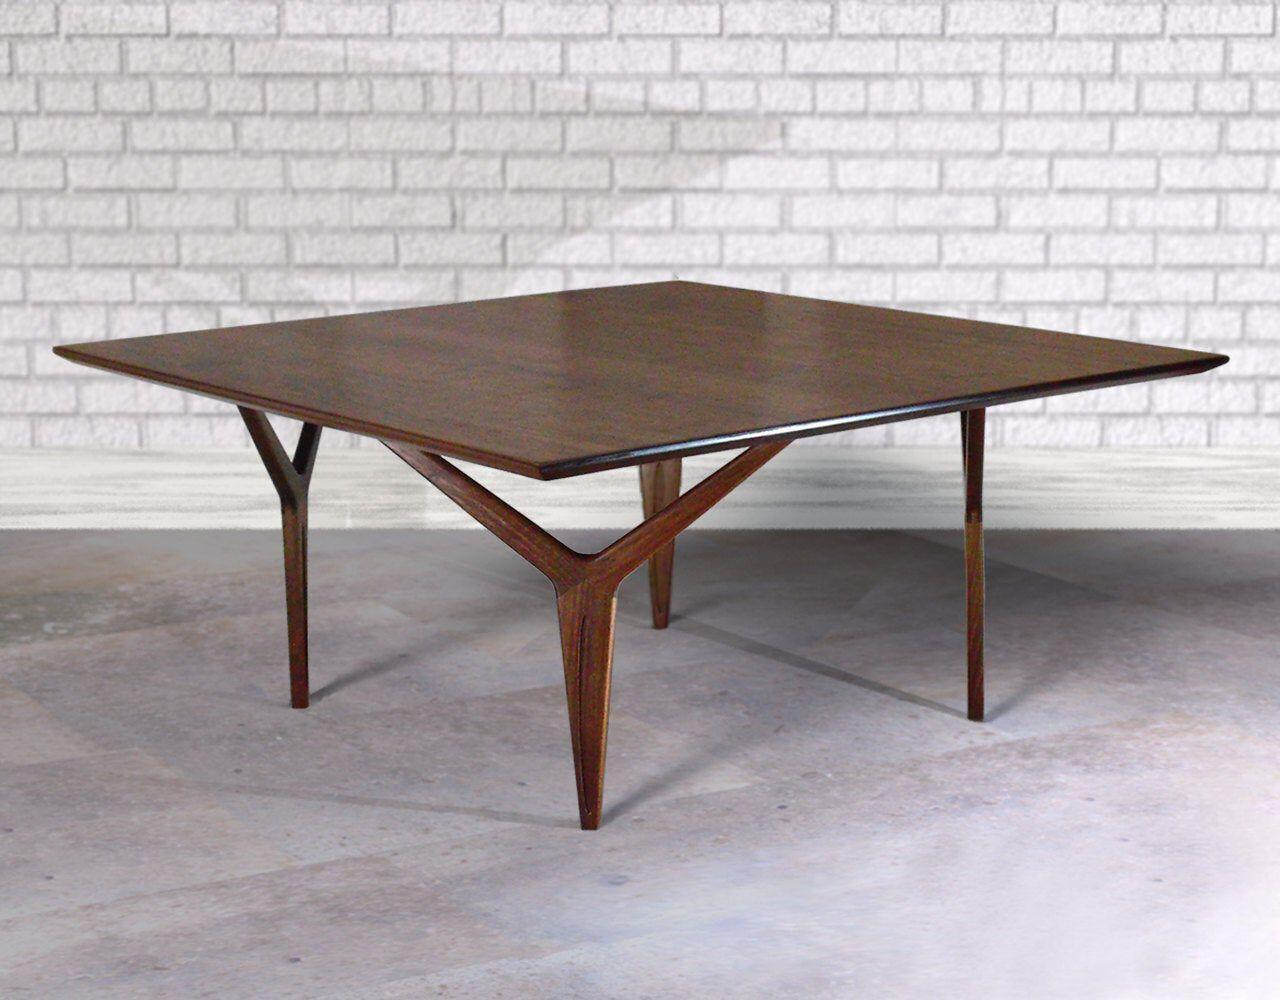 Walnut Coffee Table Modern Wishbone Leg Design Mid Century Danish Design Influence Walnut Coffee Table Modern Walnut Coffee Table Large Square Coffee Table [ 1000 x 1280 Pixel ]